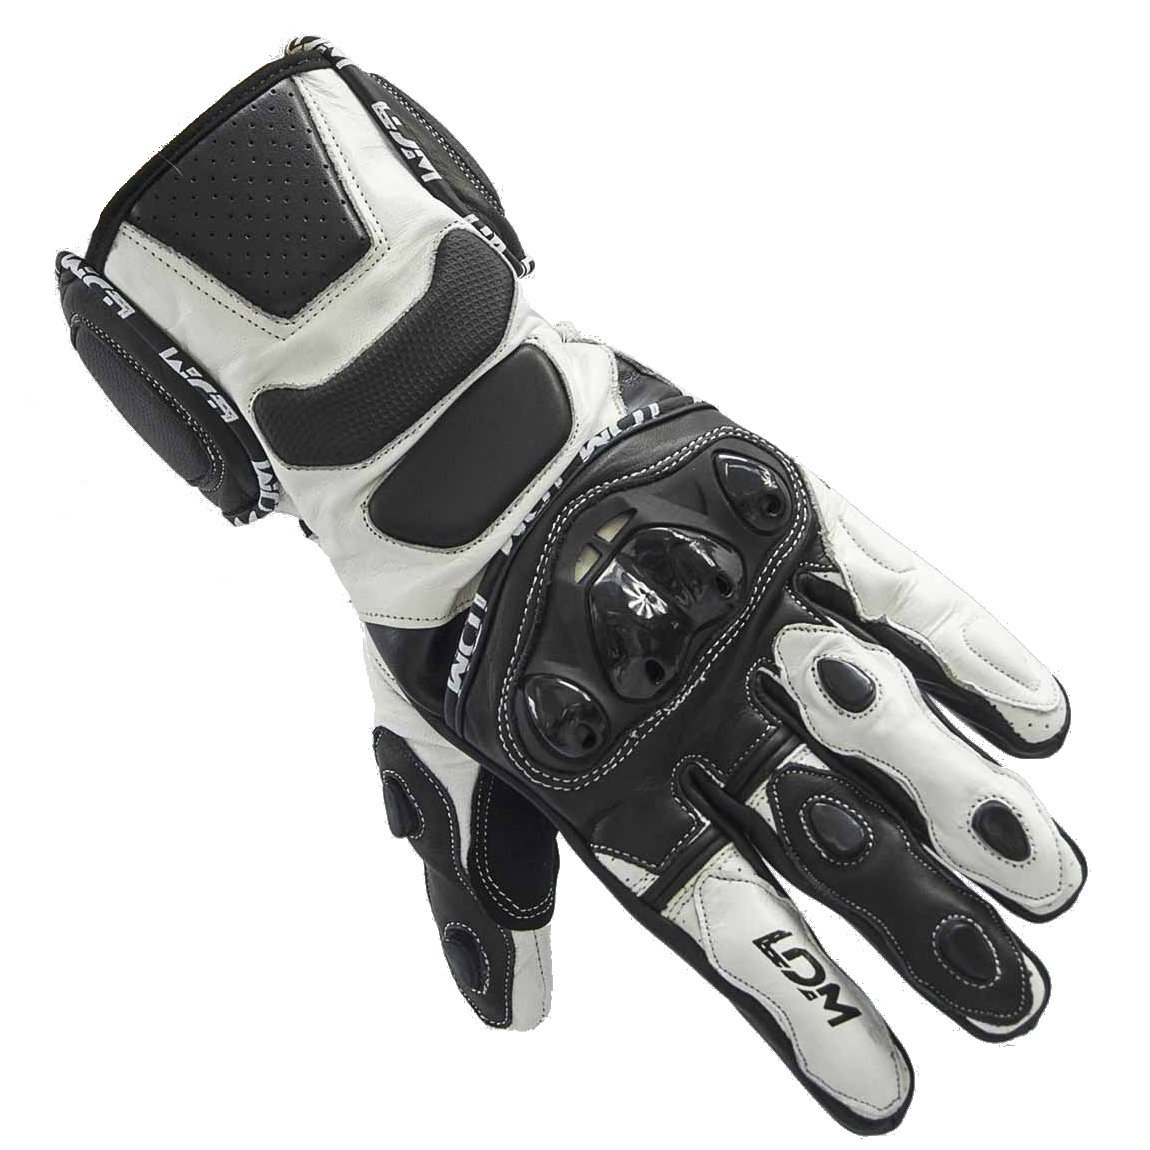 LDM Street-R Motorcycle Motorbike Race Leather Gloves Black White